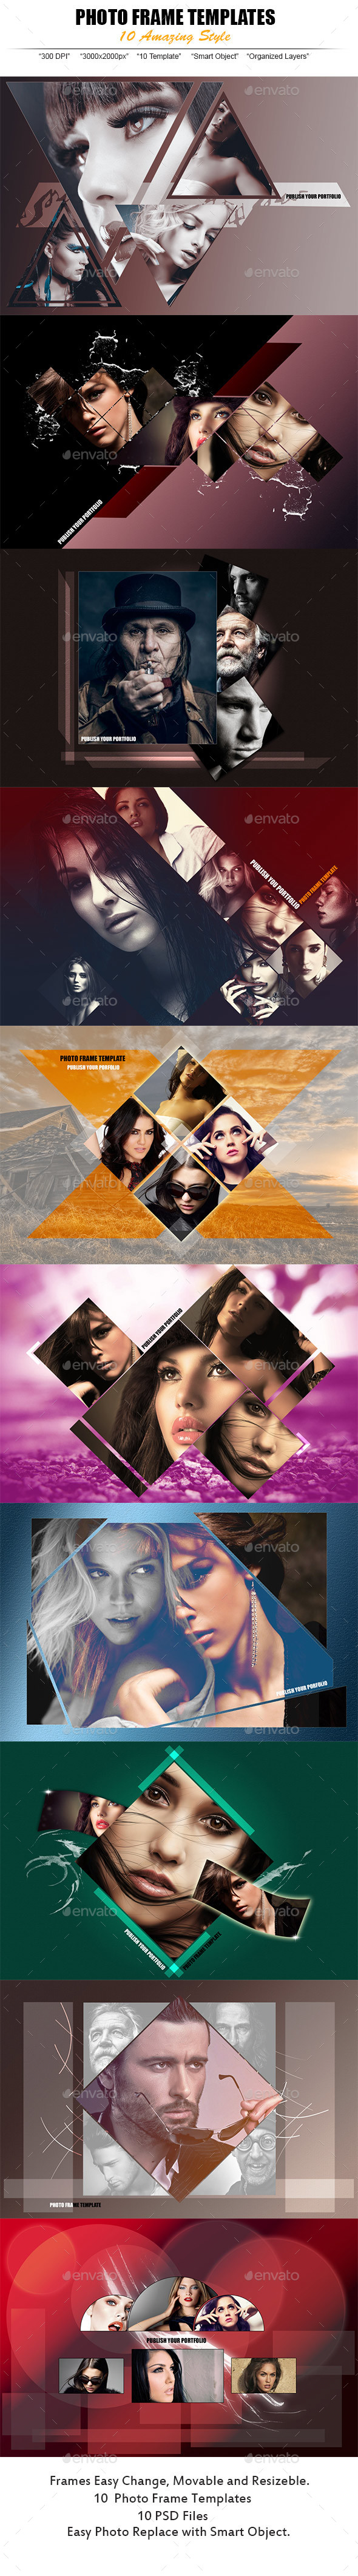 Web Photo Templates - Photo Templates Graphics